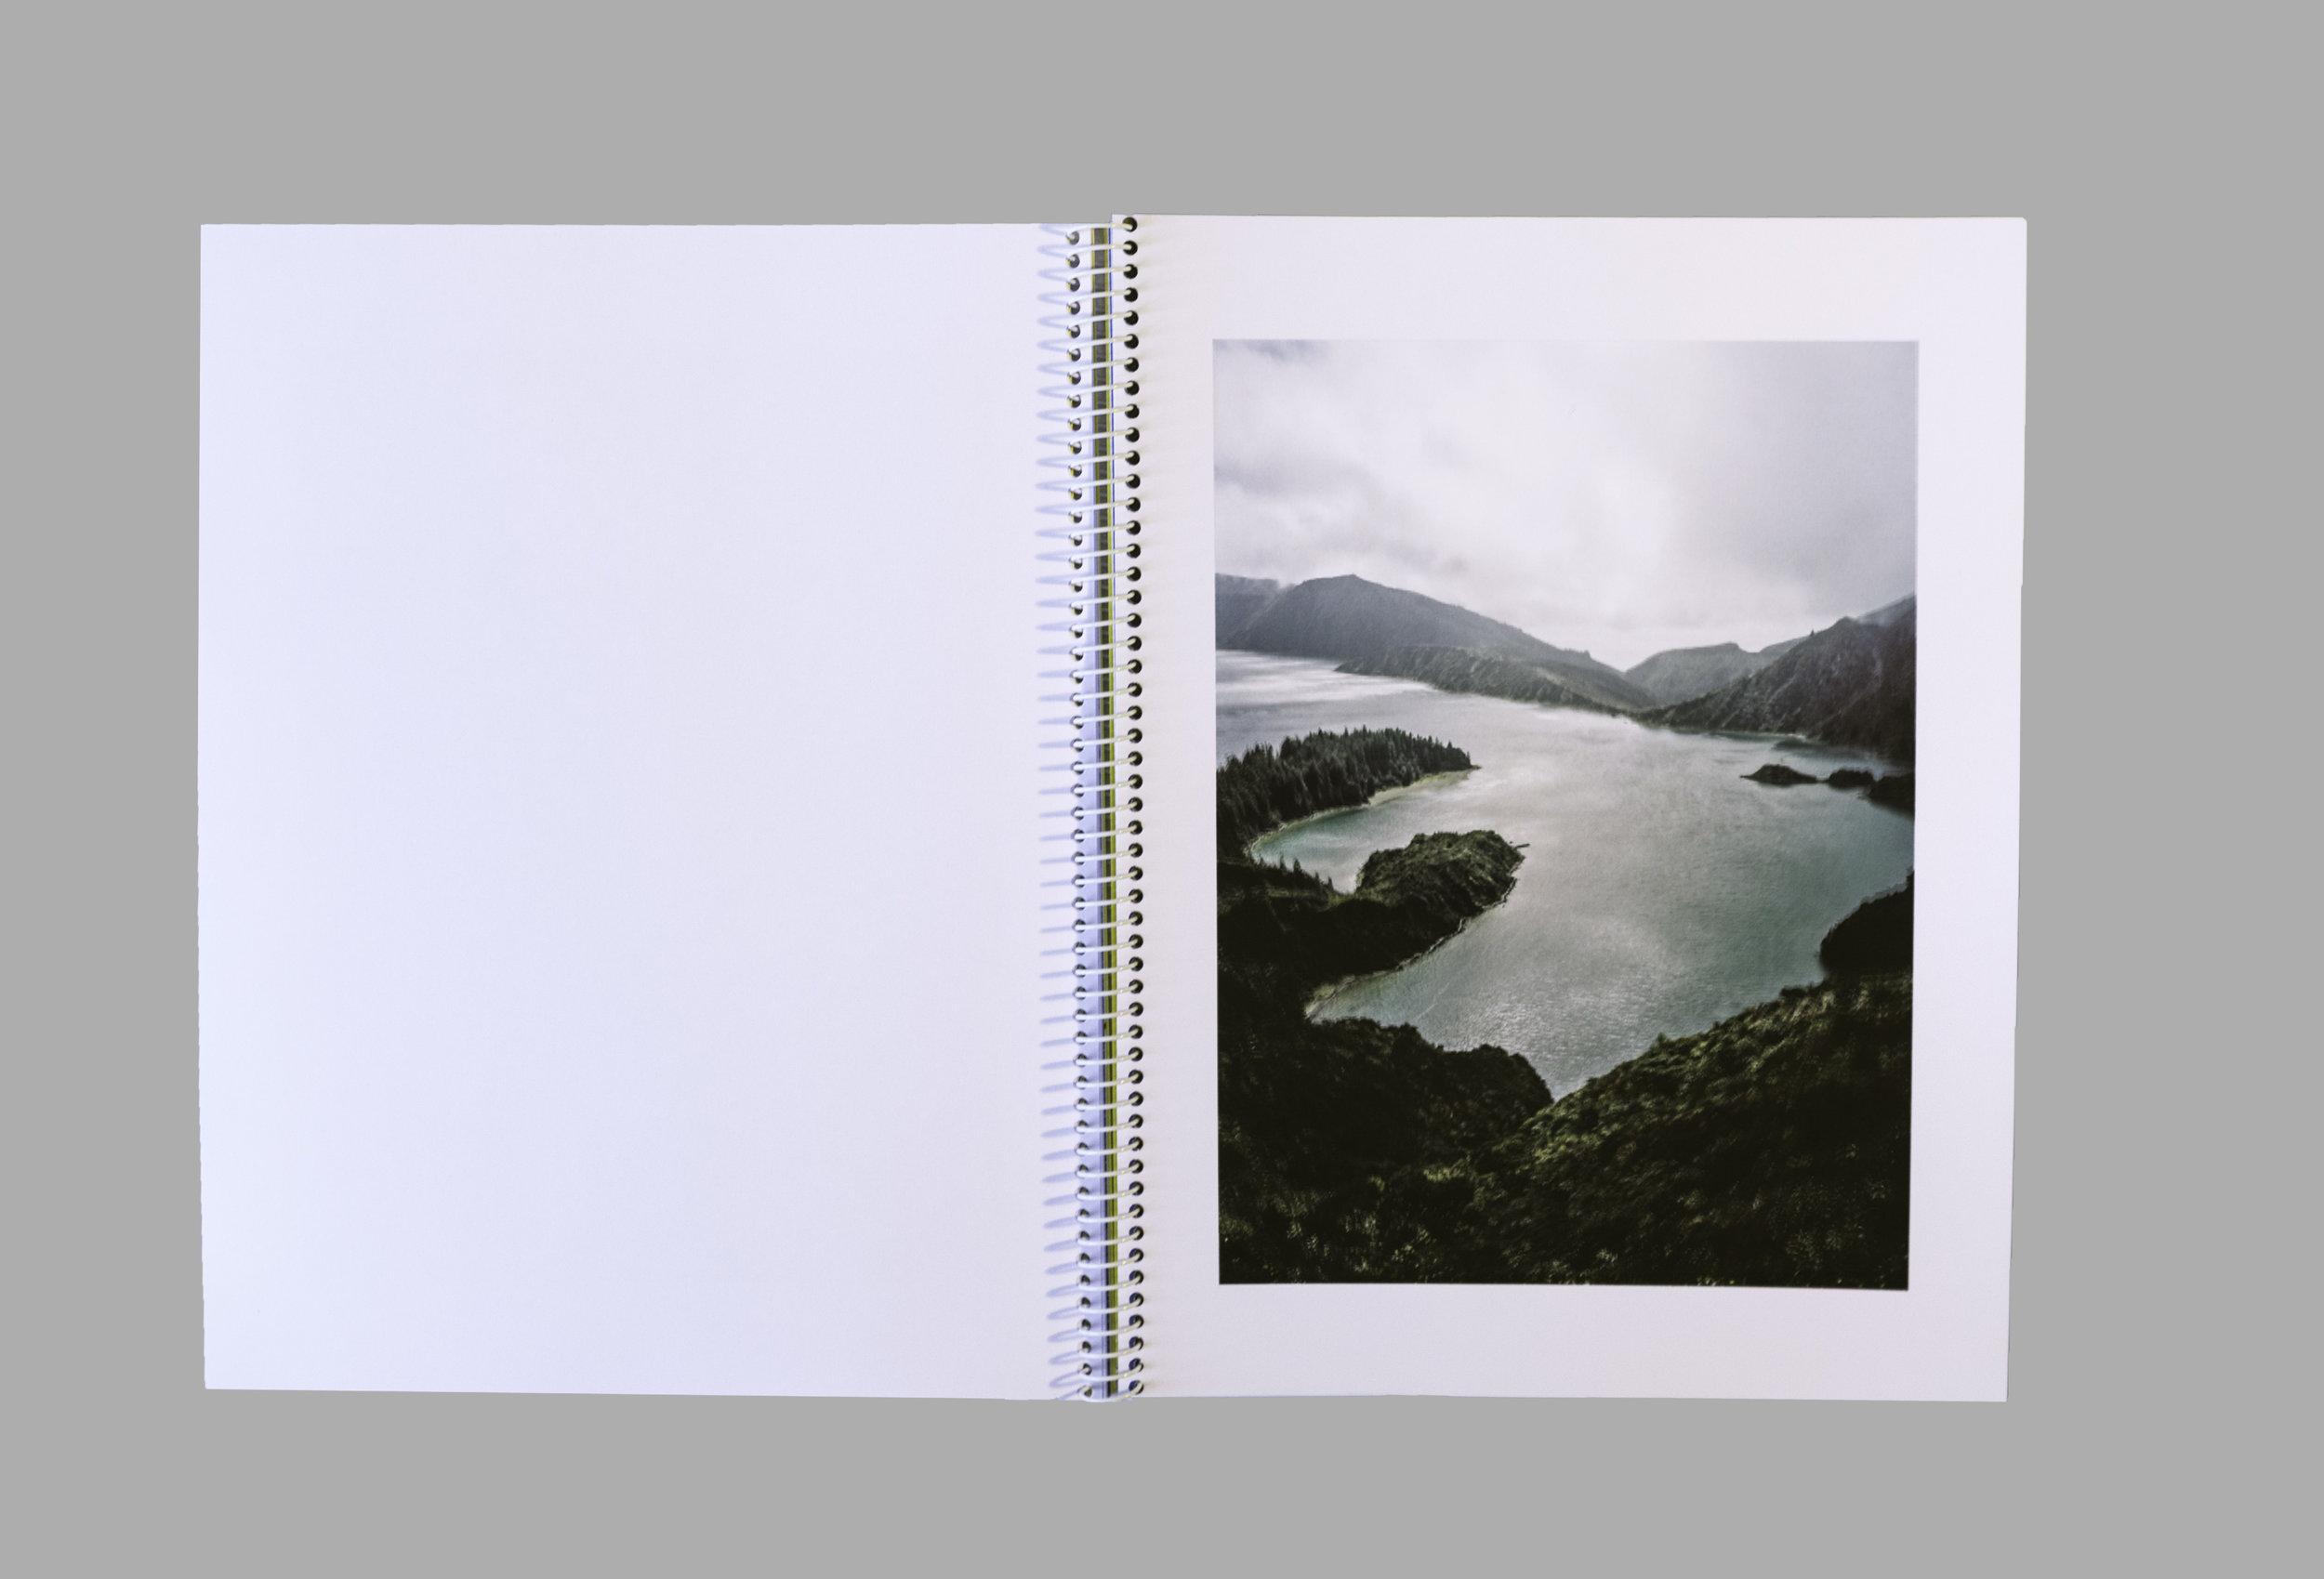 CP_ANTILIA_SPRIAL BOUND_PAGES_009.jpg